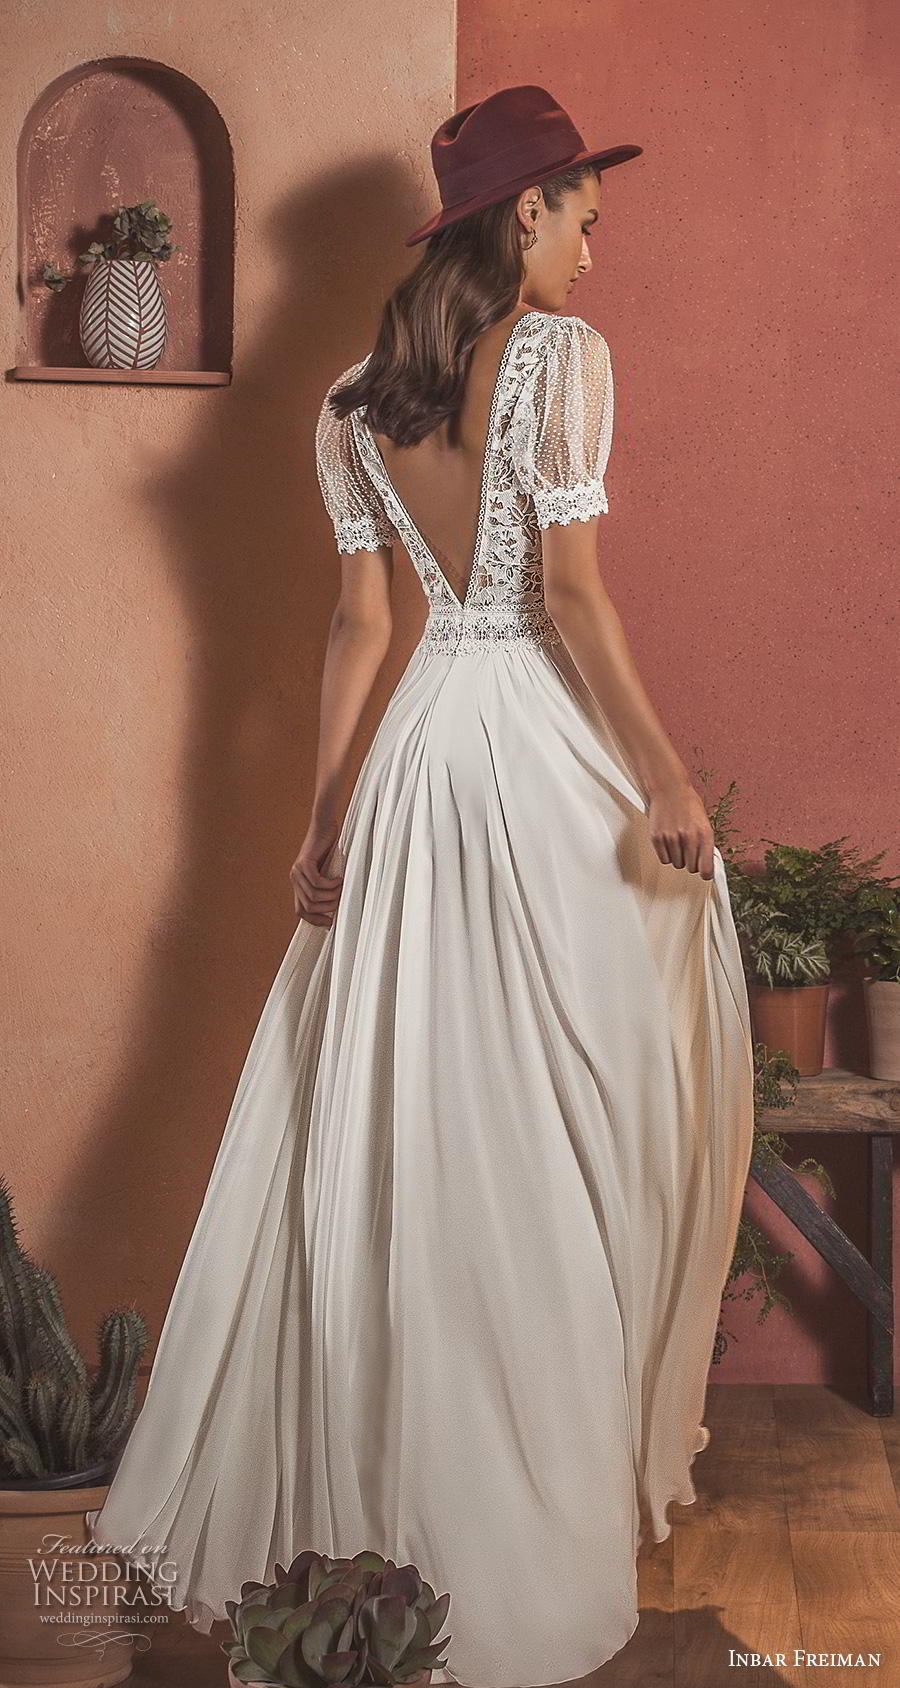 Inbar Freiman 2020 Wedding Dresses Wild Feather Bridal Collection Wedding Inspirasi,Mother In Law Wears Wedding Dress To Sons Wedding